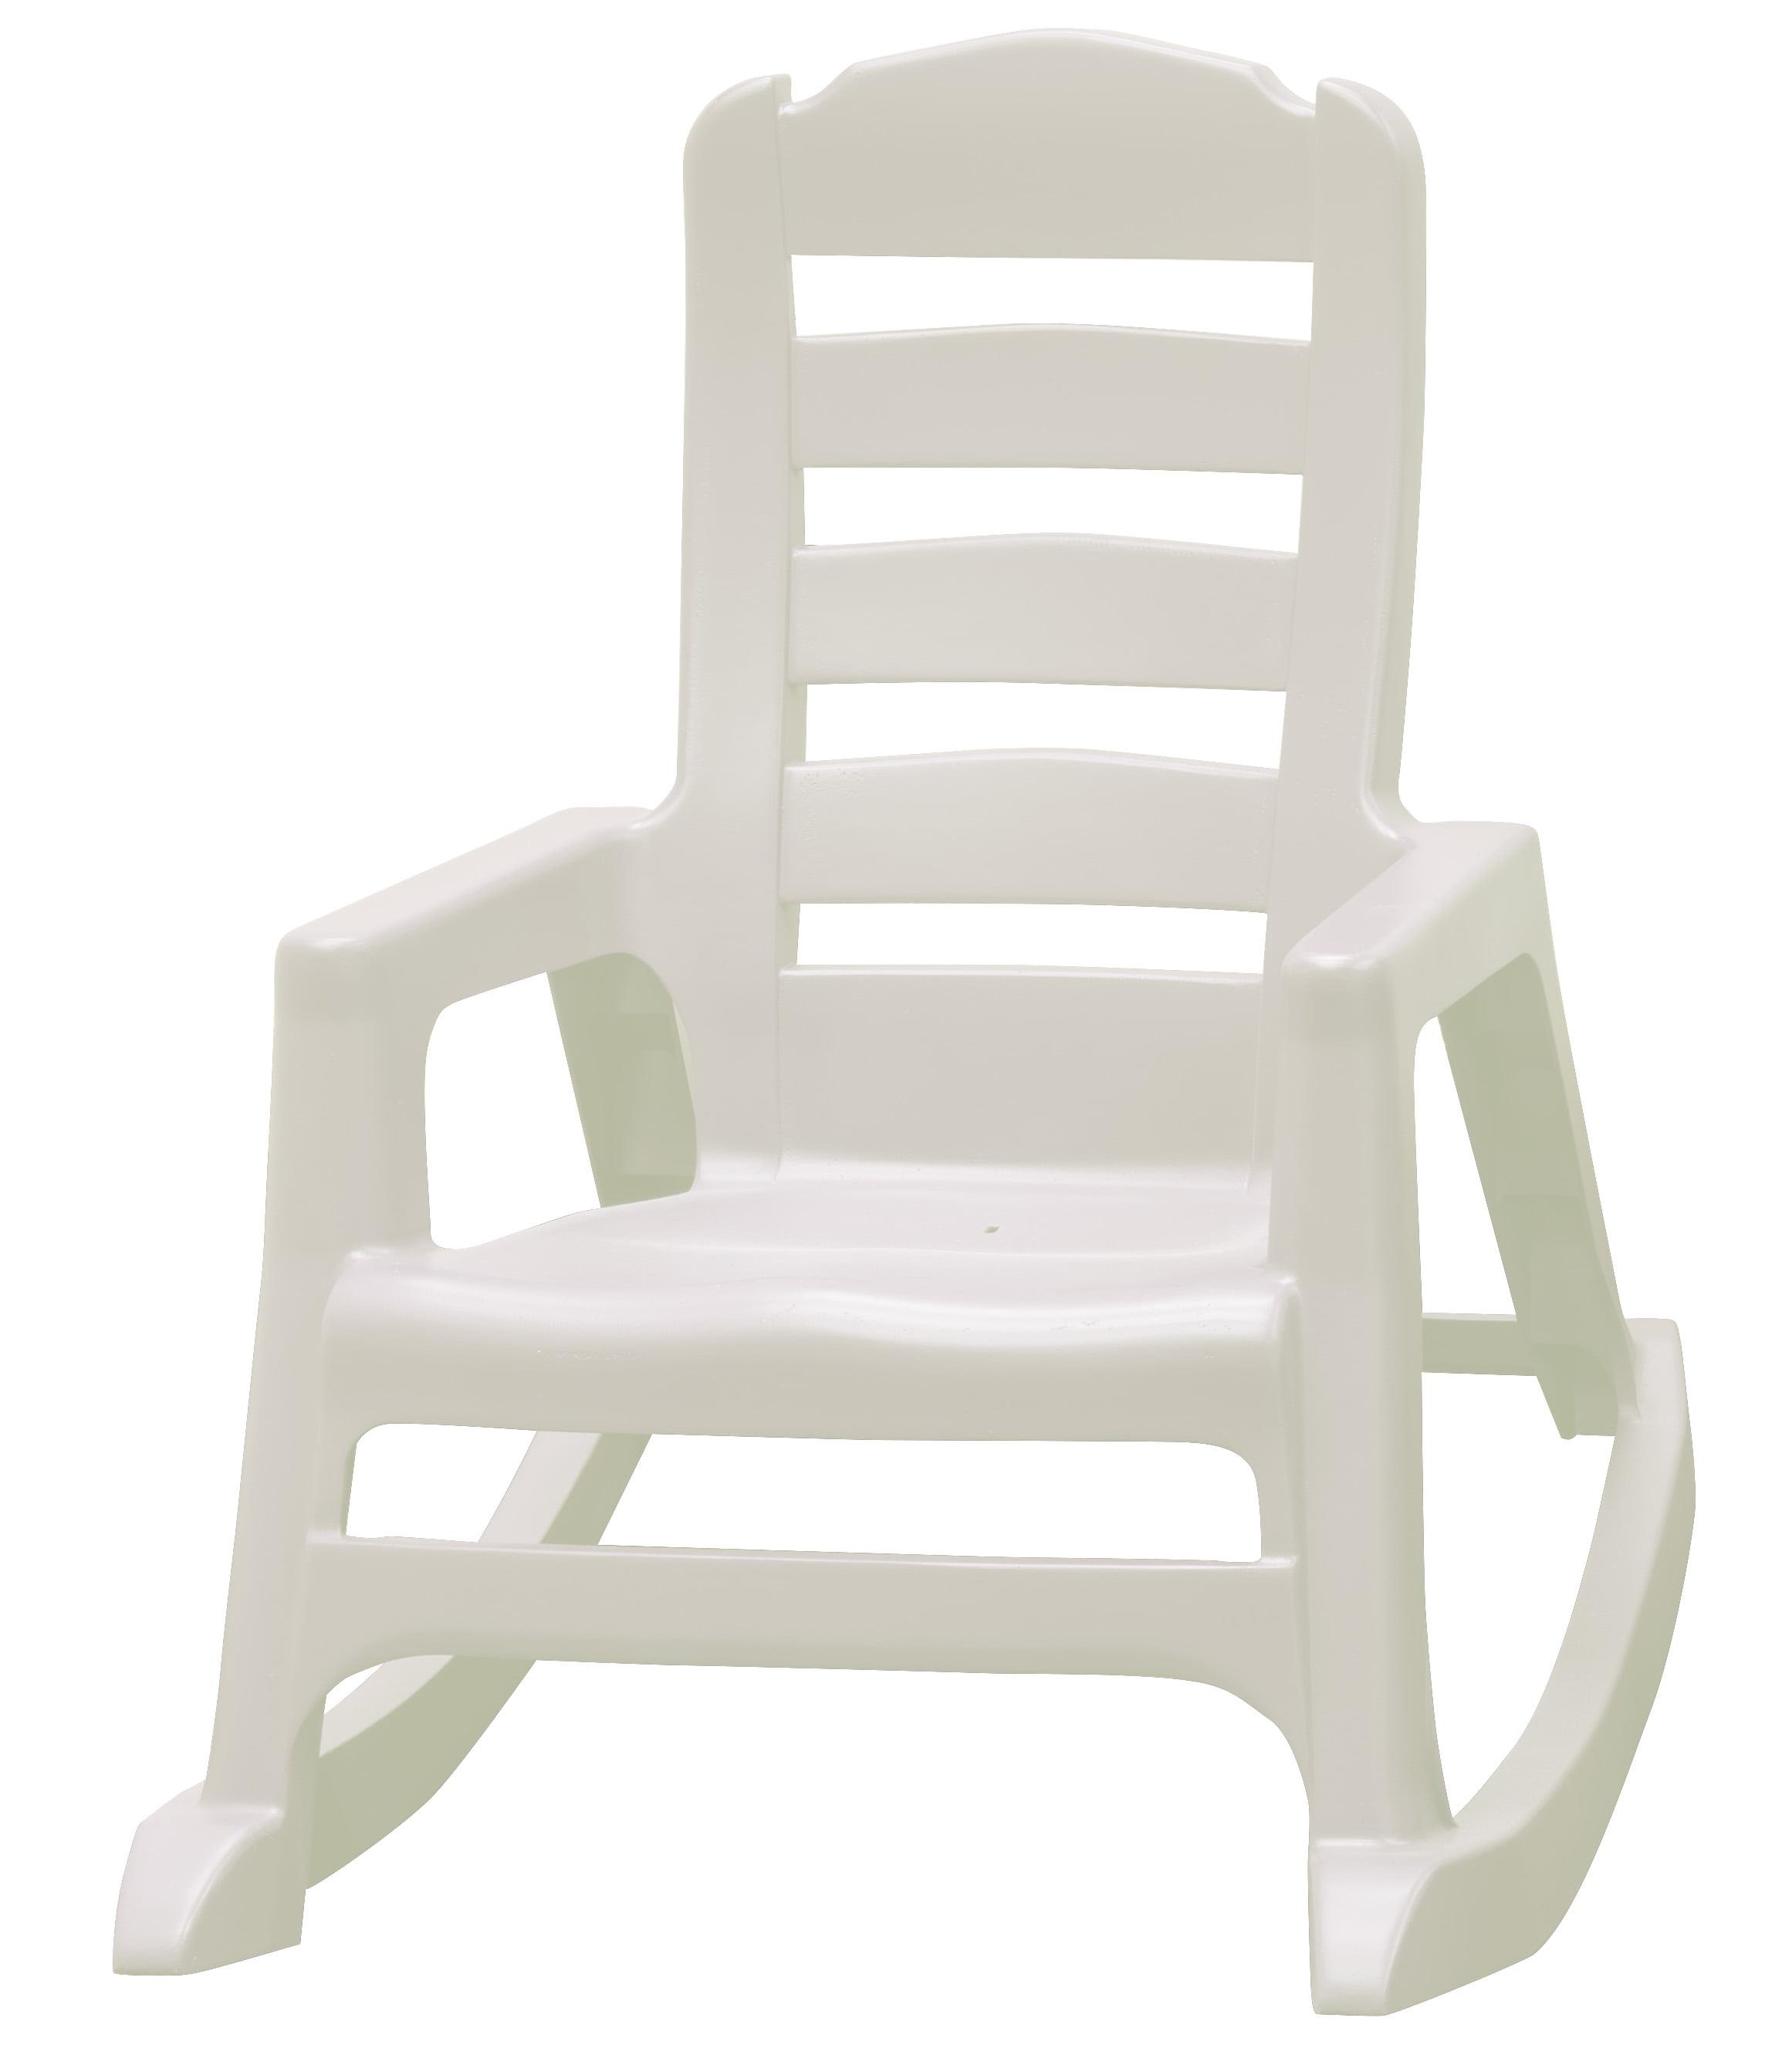 Adams Adirondack Kids Lil Easy Rocking Chair White